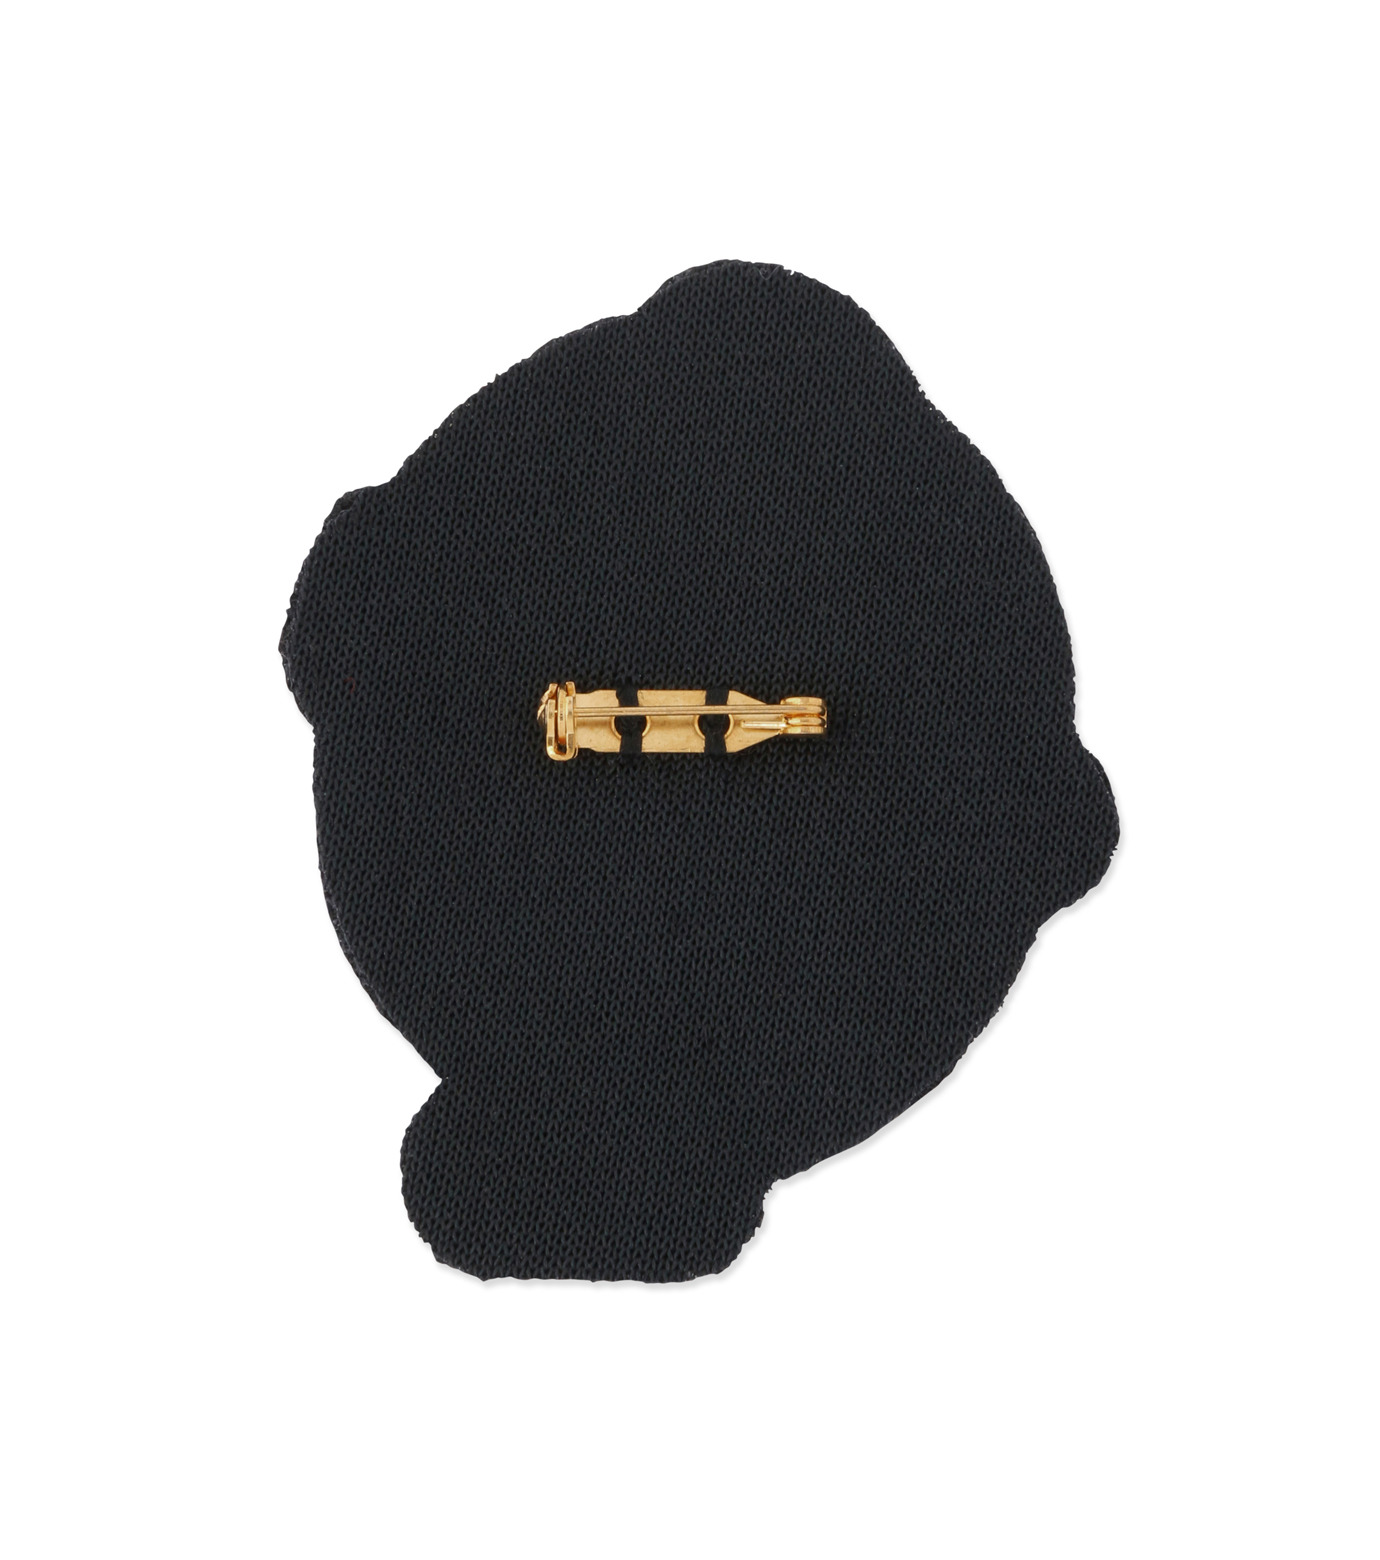 Olympia Le-Tan(オリンピア ルタン)のLittle Miss Shy Velcro Patches-TURQUOISE(アクセサリー/accessory)-FW16APA011-95 拡大詳細画像2